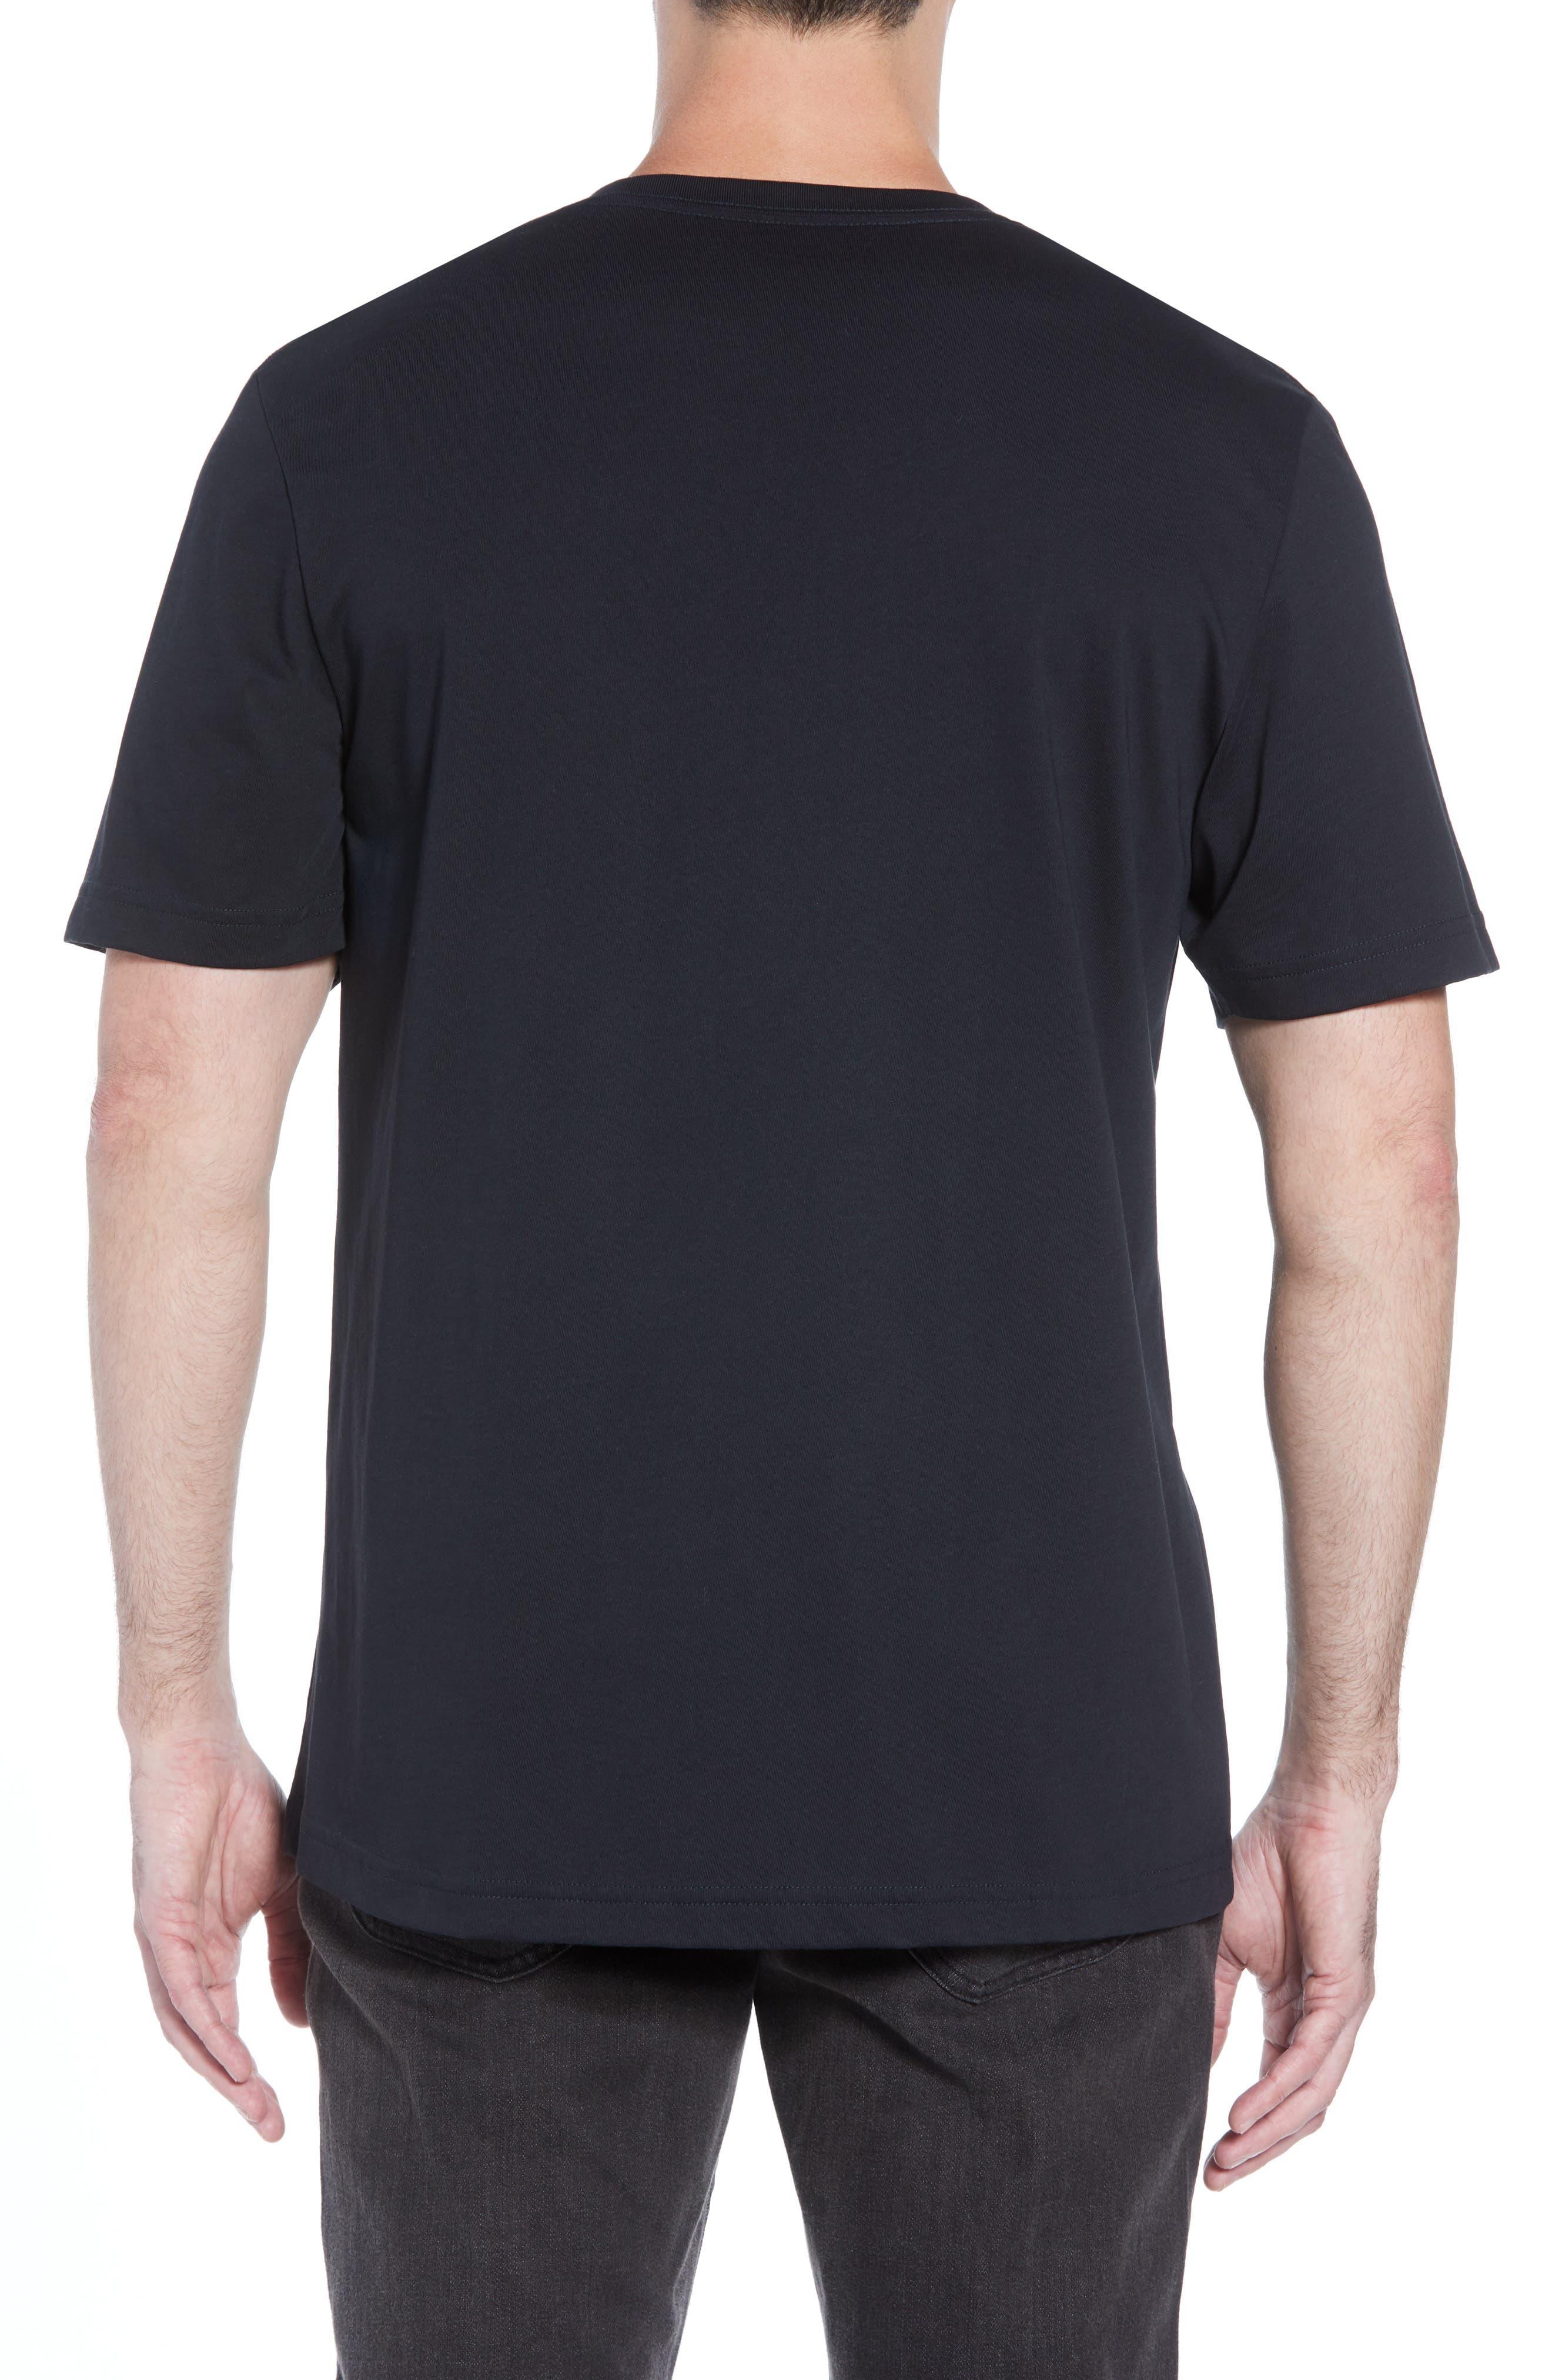 Rock City Crewneck T-Shirt,                             Alternate thumbnail 2, color,                             BLACK